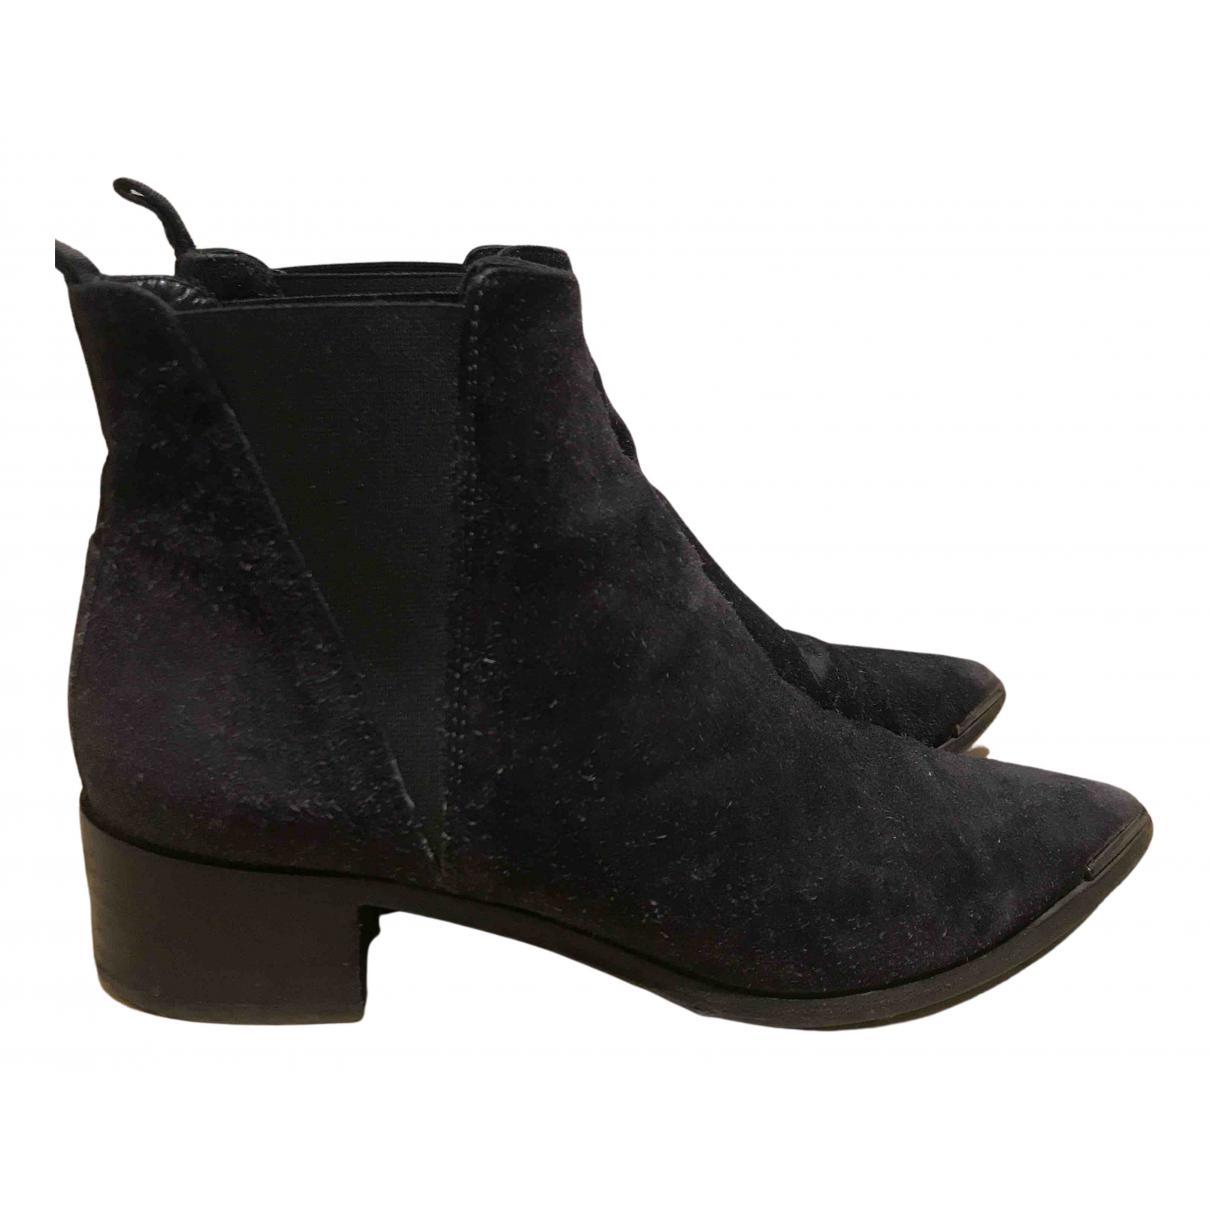 Acne Studios Jensen / Jenny Blue Suede Ankle boots for Women 36 EU